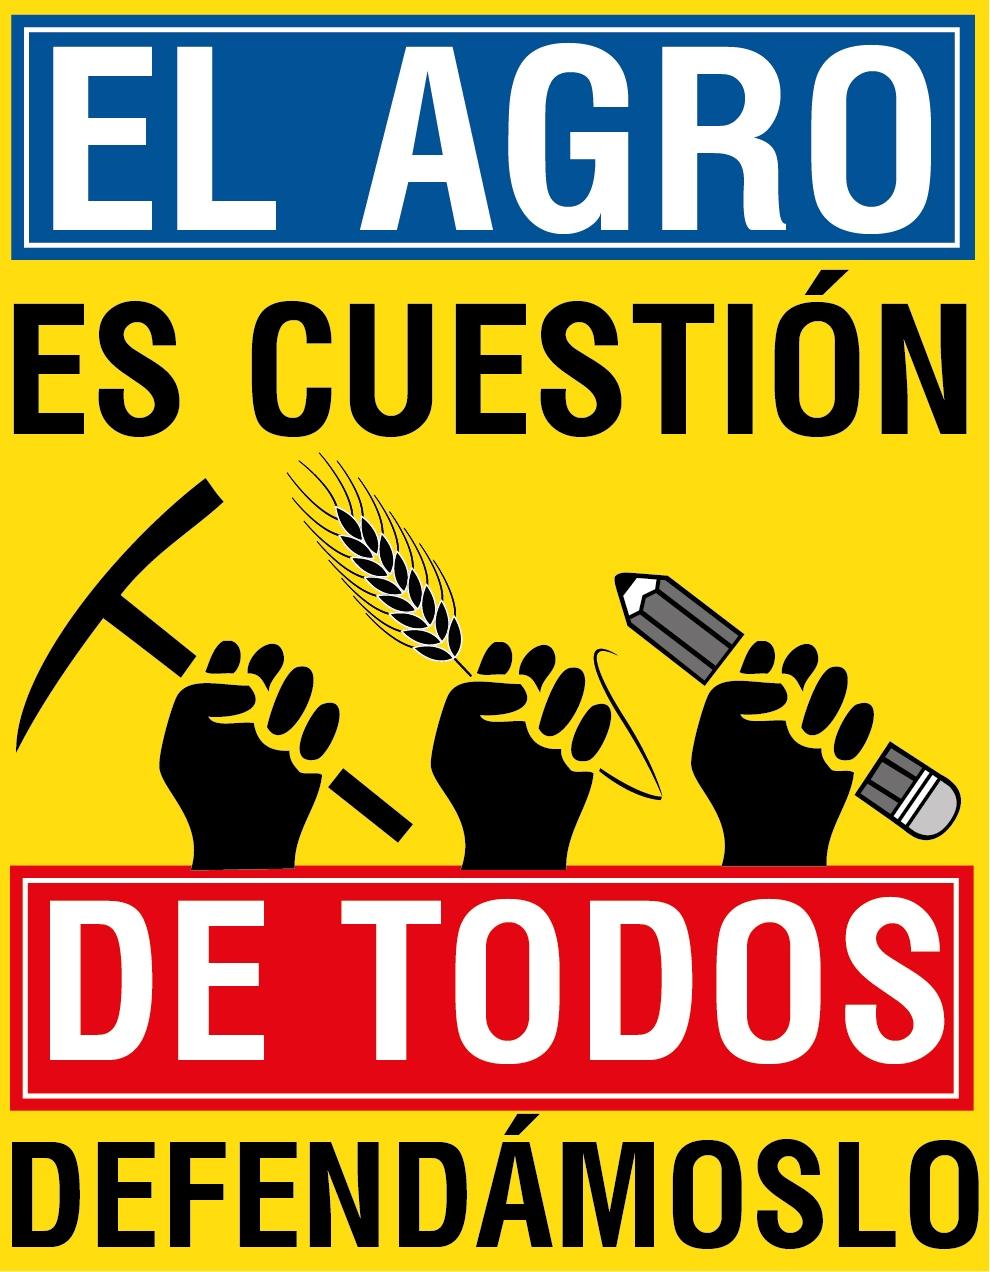 http://3.bp.blogspot.com/-OgeO3B9fUKA/Uihv6Ii6iVI/AAAAAAAAAXc/0C5TaLjyPNk/s1600/CARTELES+PARO+AGRARIO+19+SEP-03.jpg